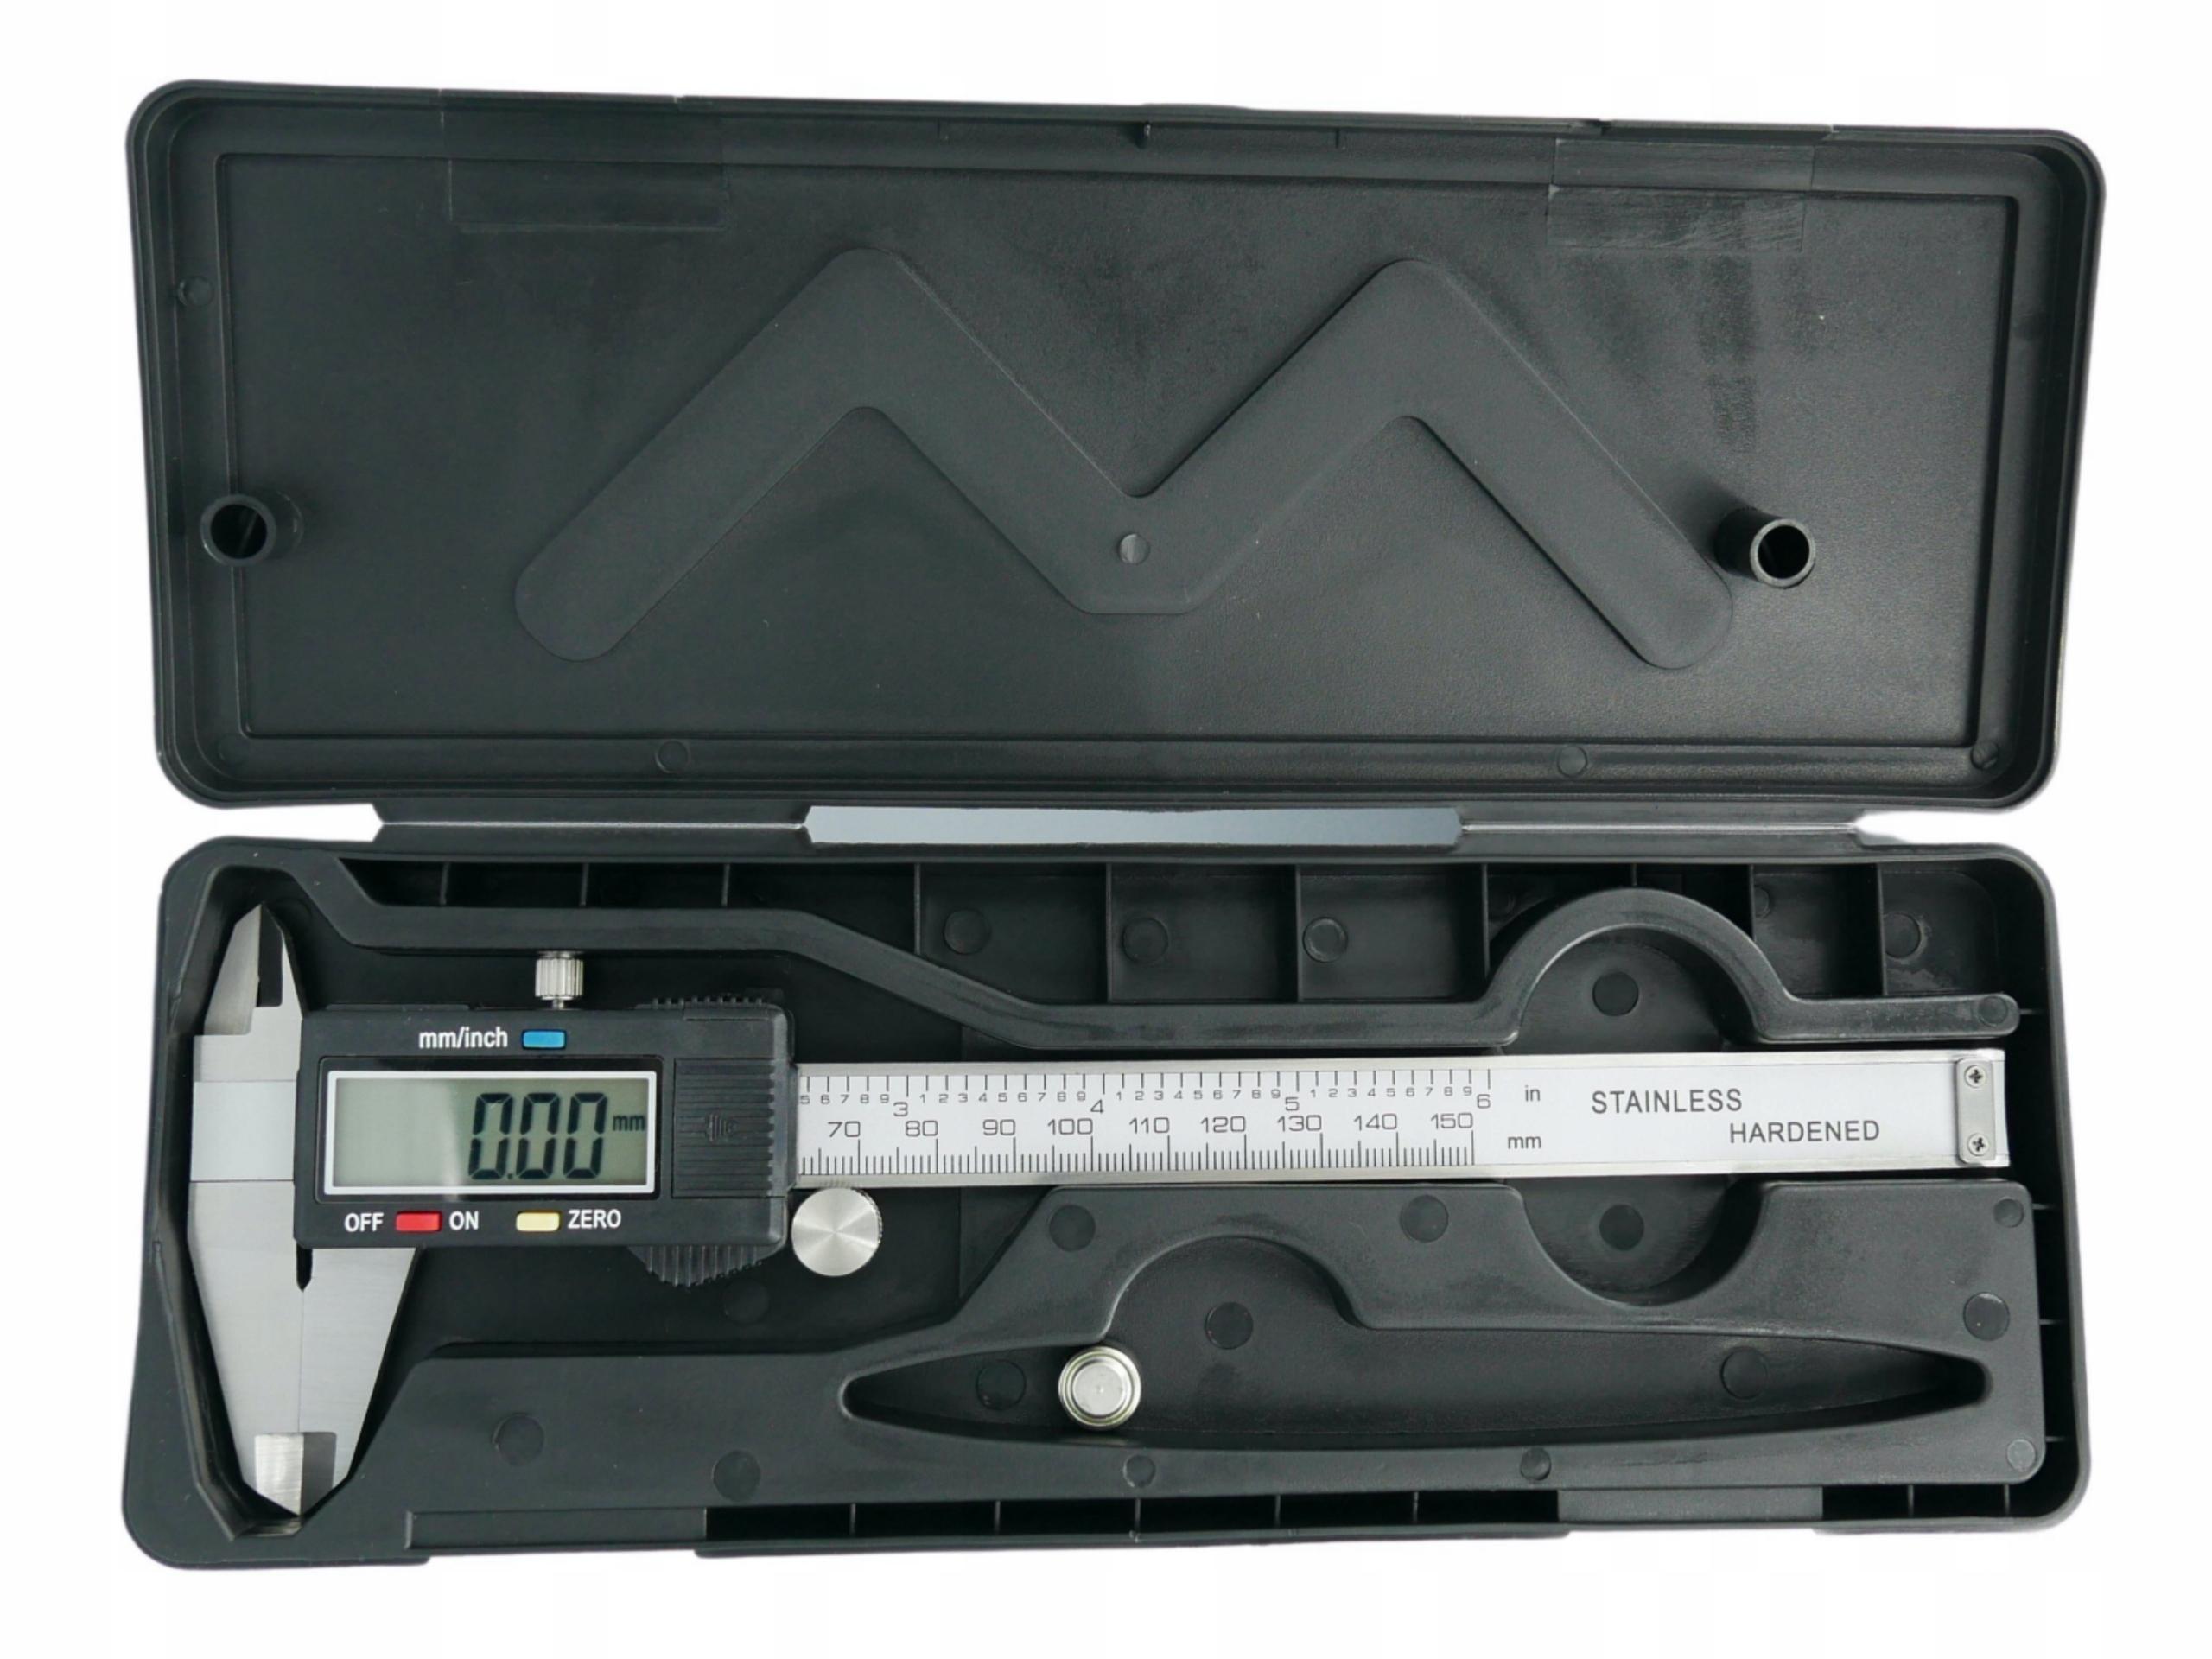 SUWMIARKA ELEKTRONICZNA CYFROWA L 150 mm METALOWA